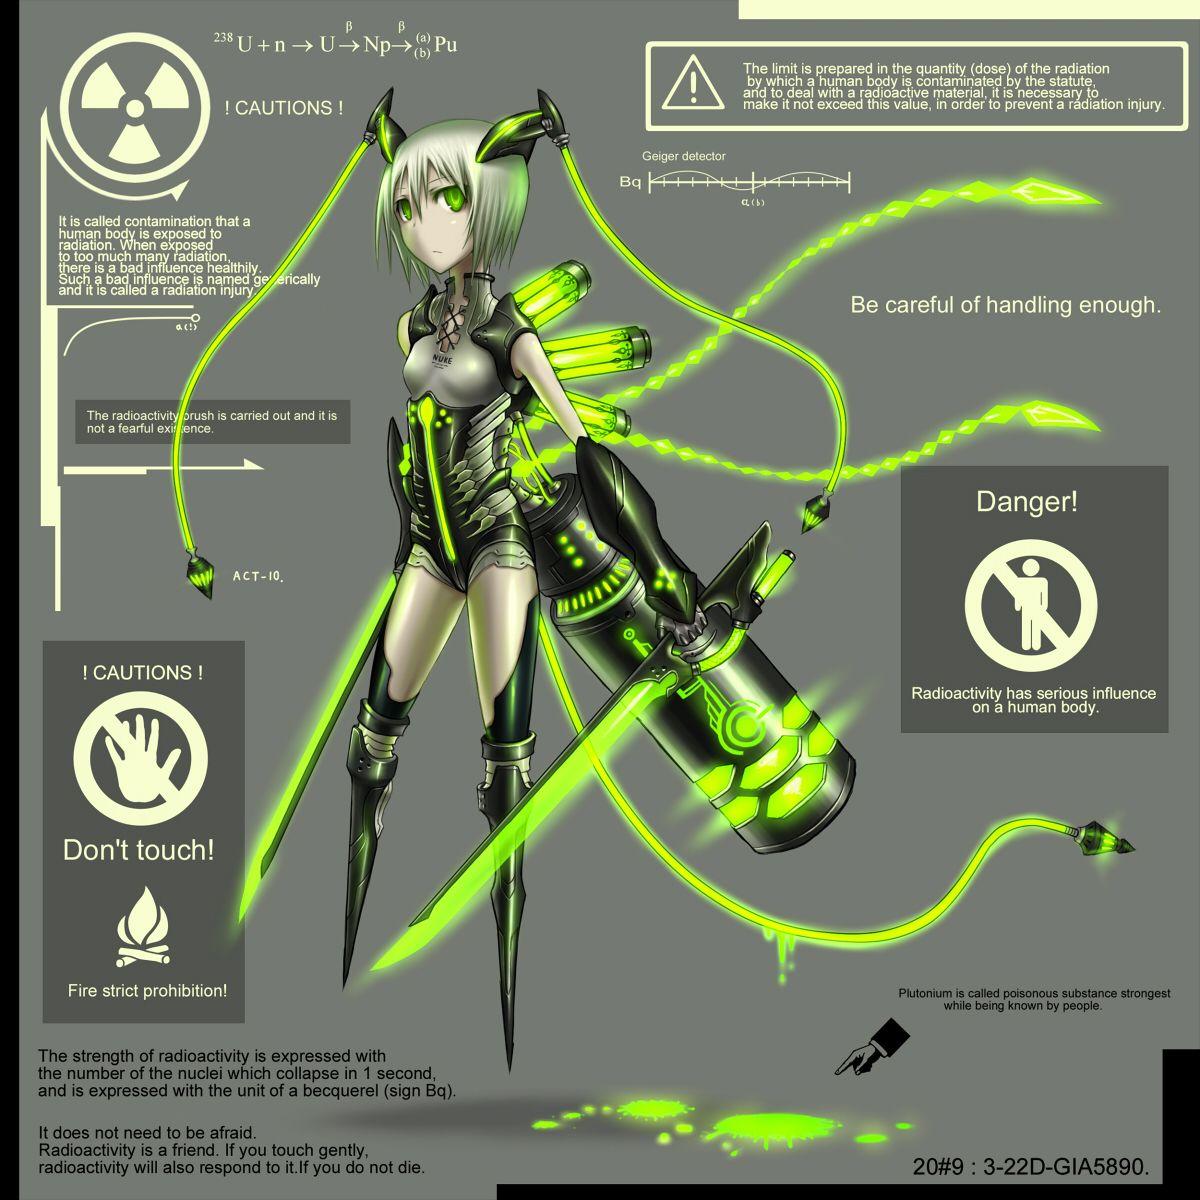 Pin By Dmk Tang On Anime Robot Girls Anime Eyes Robot Girl Computer Wallpaper Desktop Wallpapers